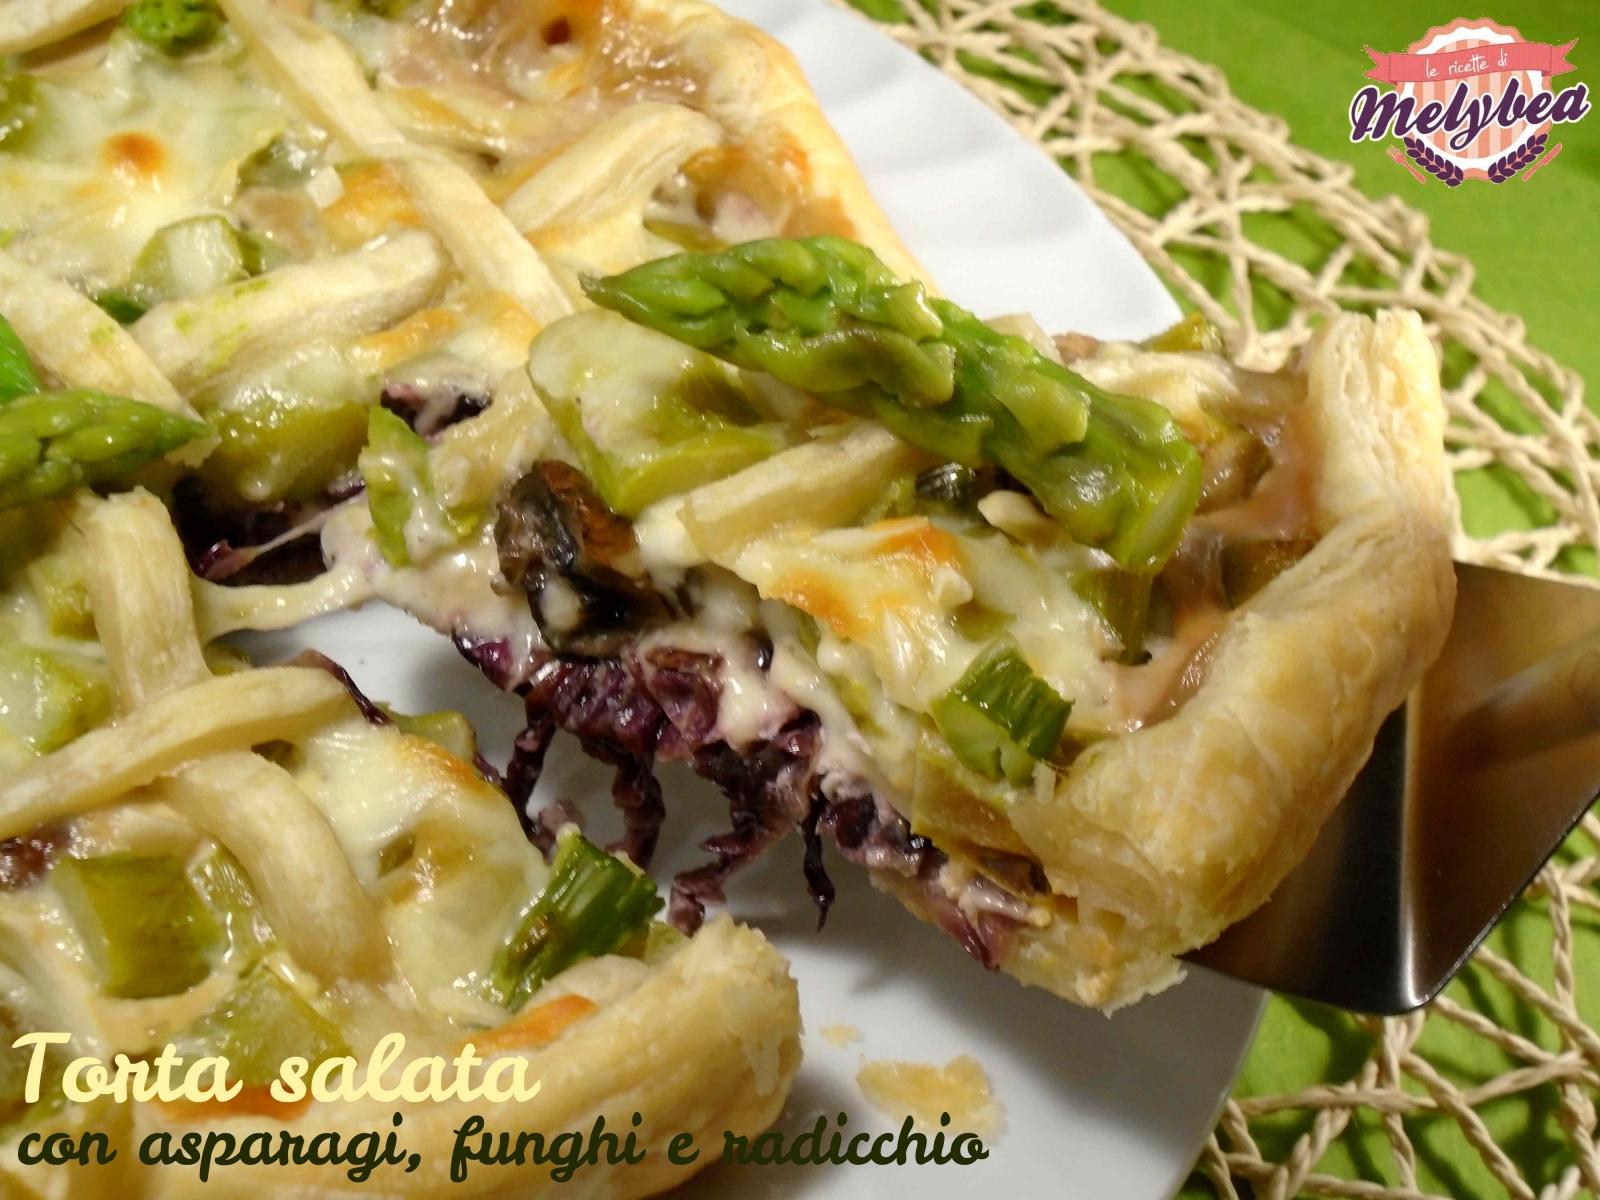 torta salata con asparagi funghi e radicchio